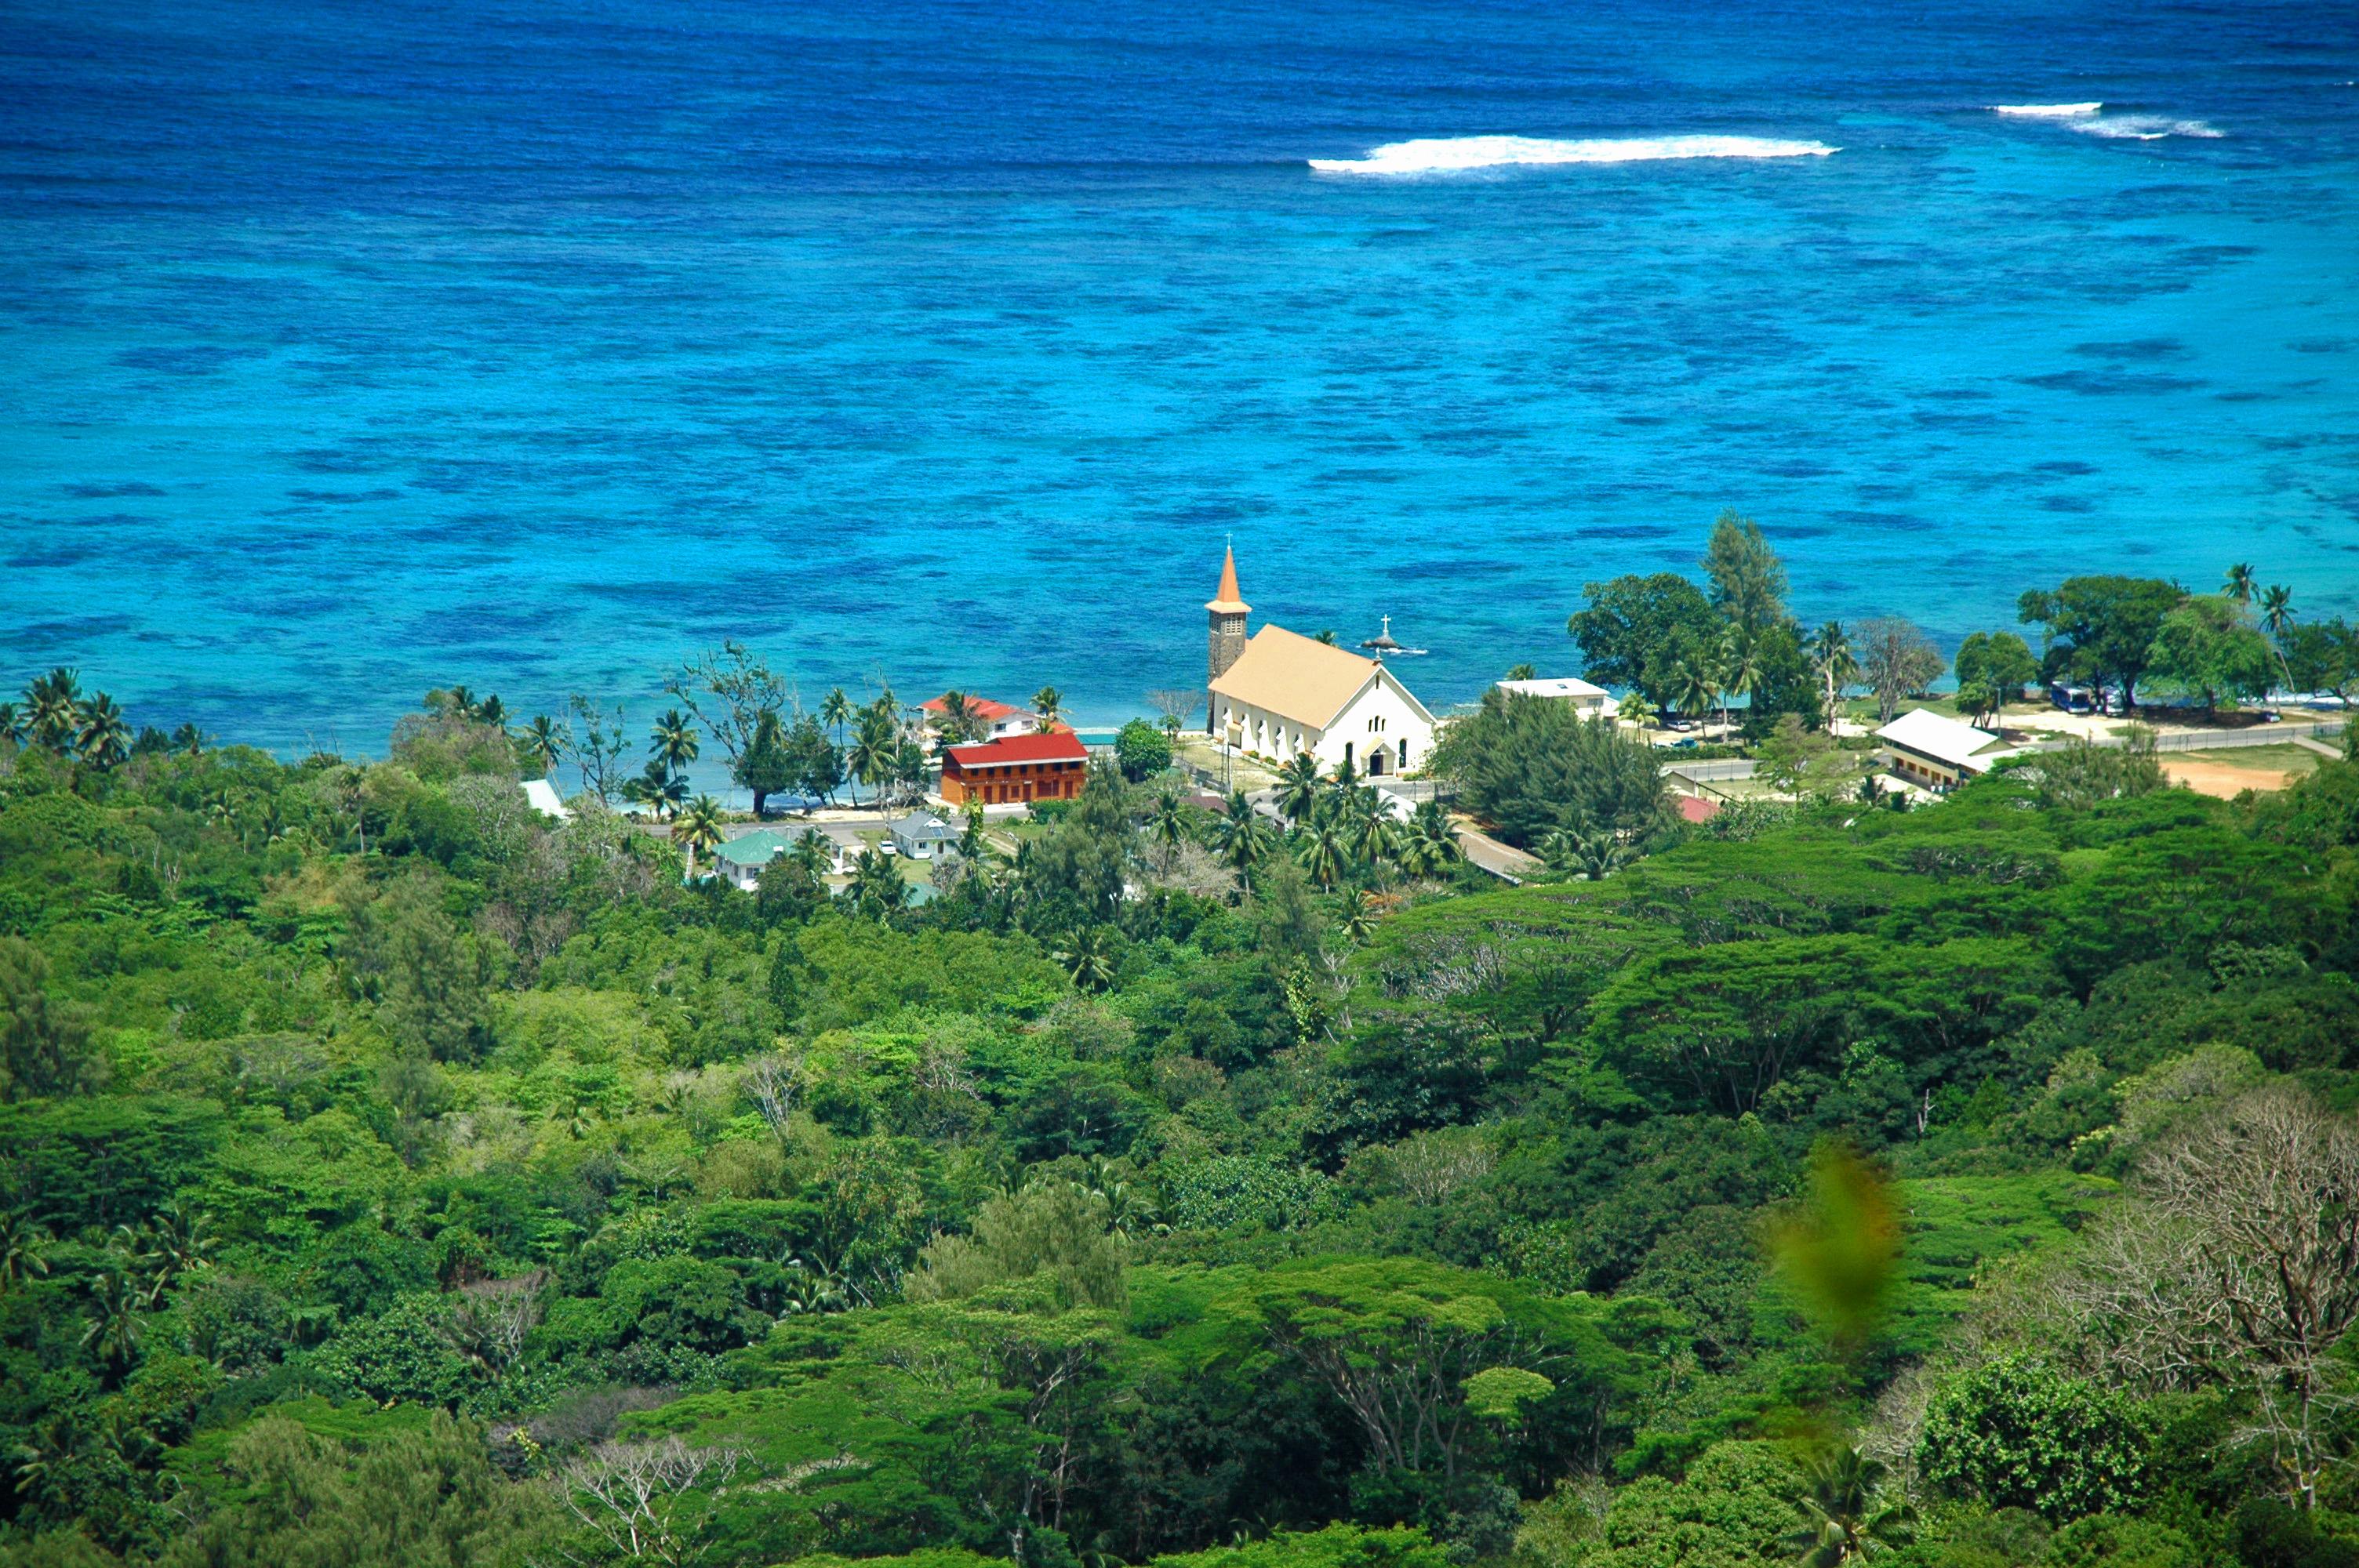 Living by the sea Seychelles © JonoVernon-powell